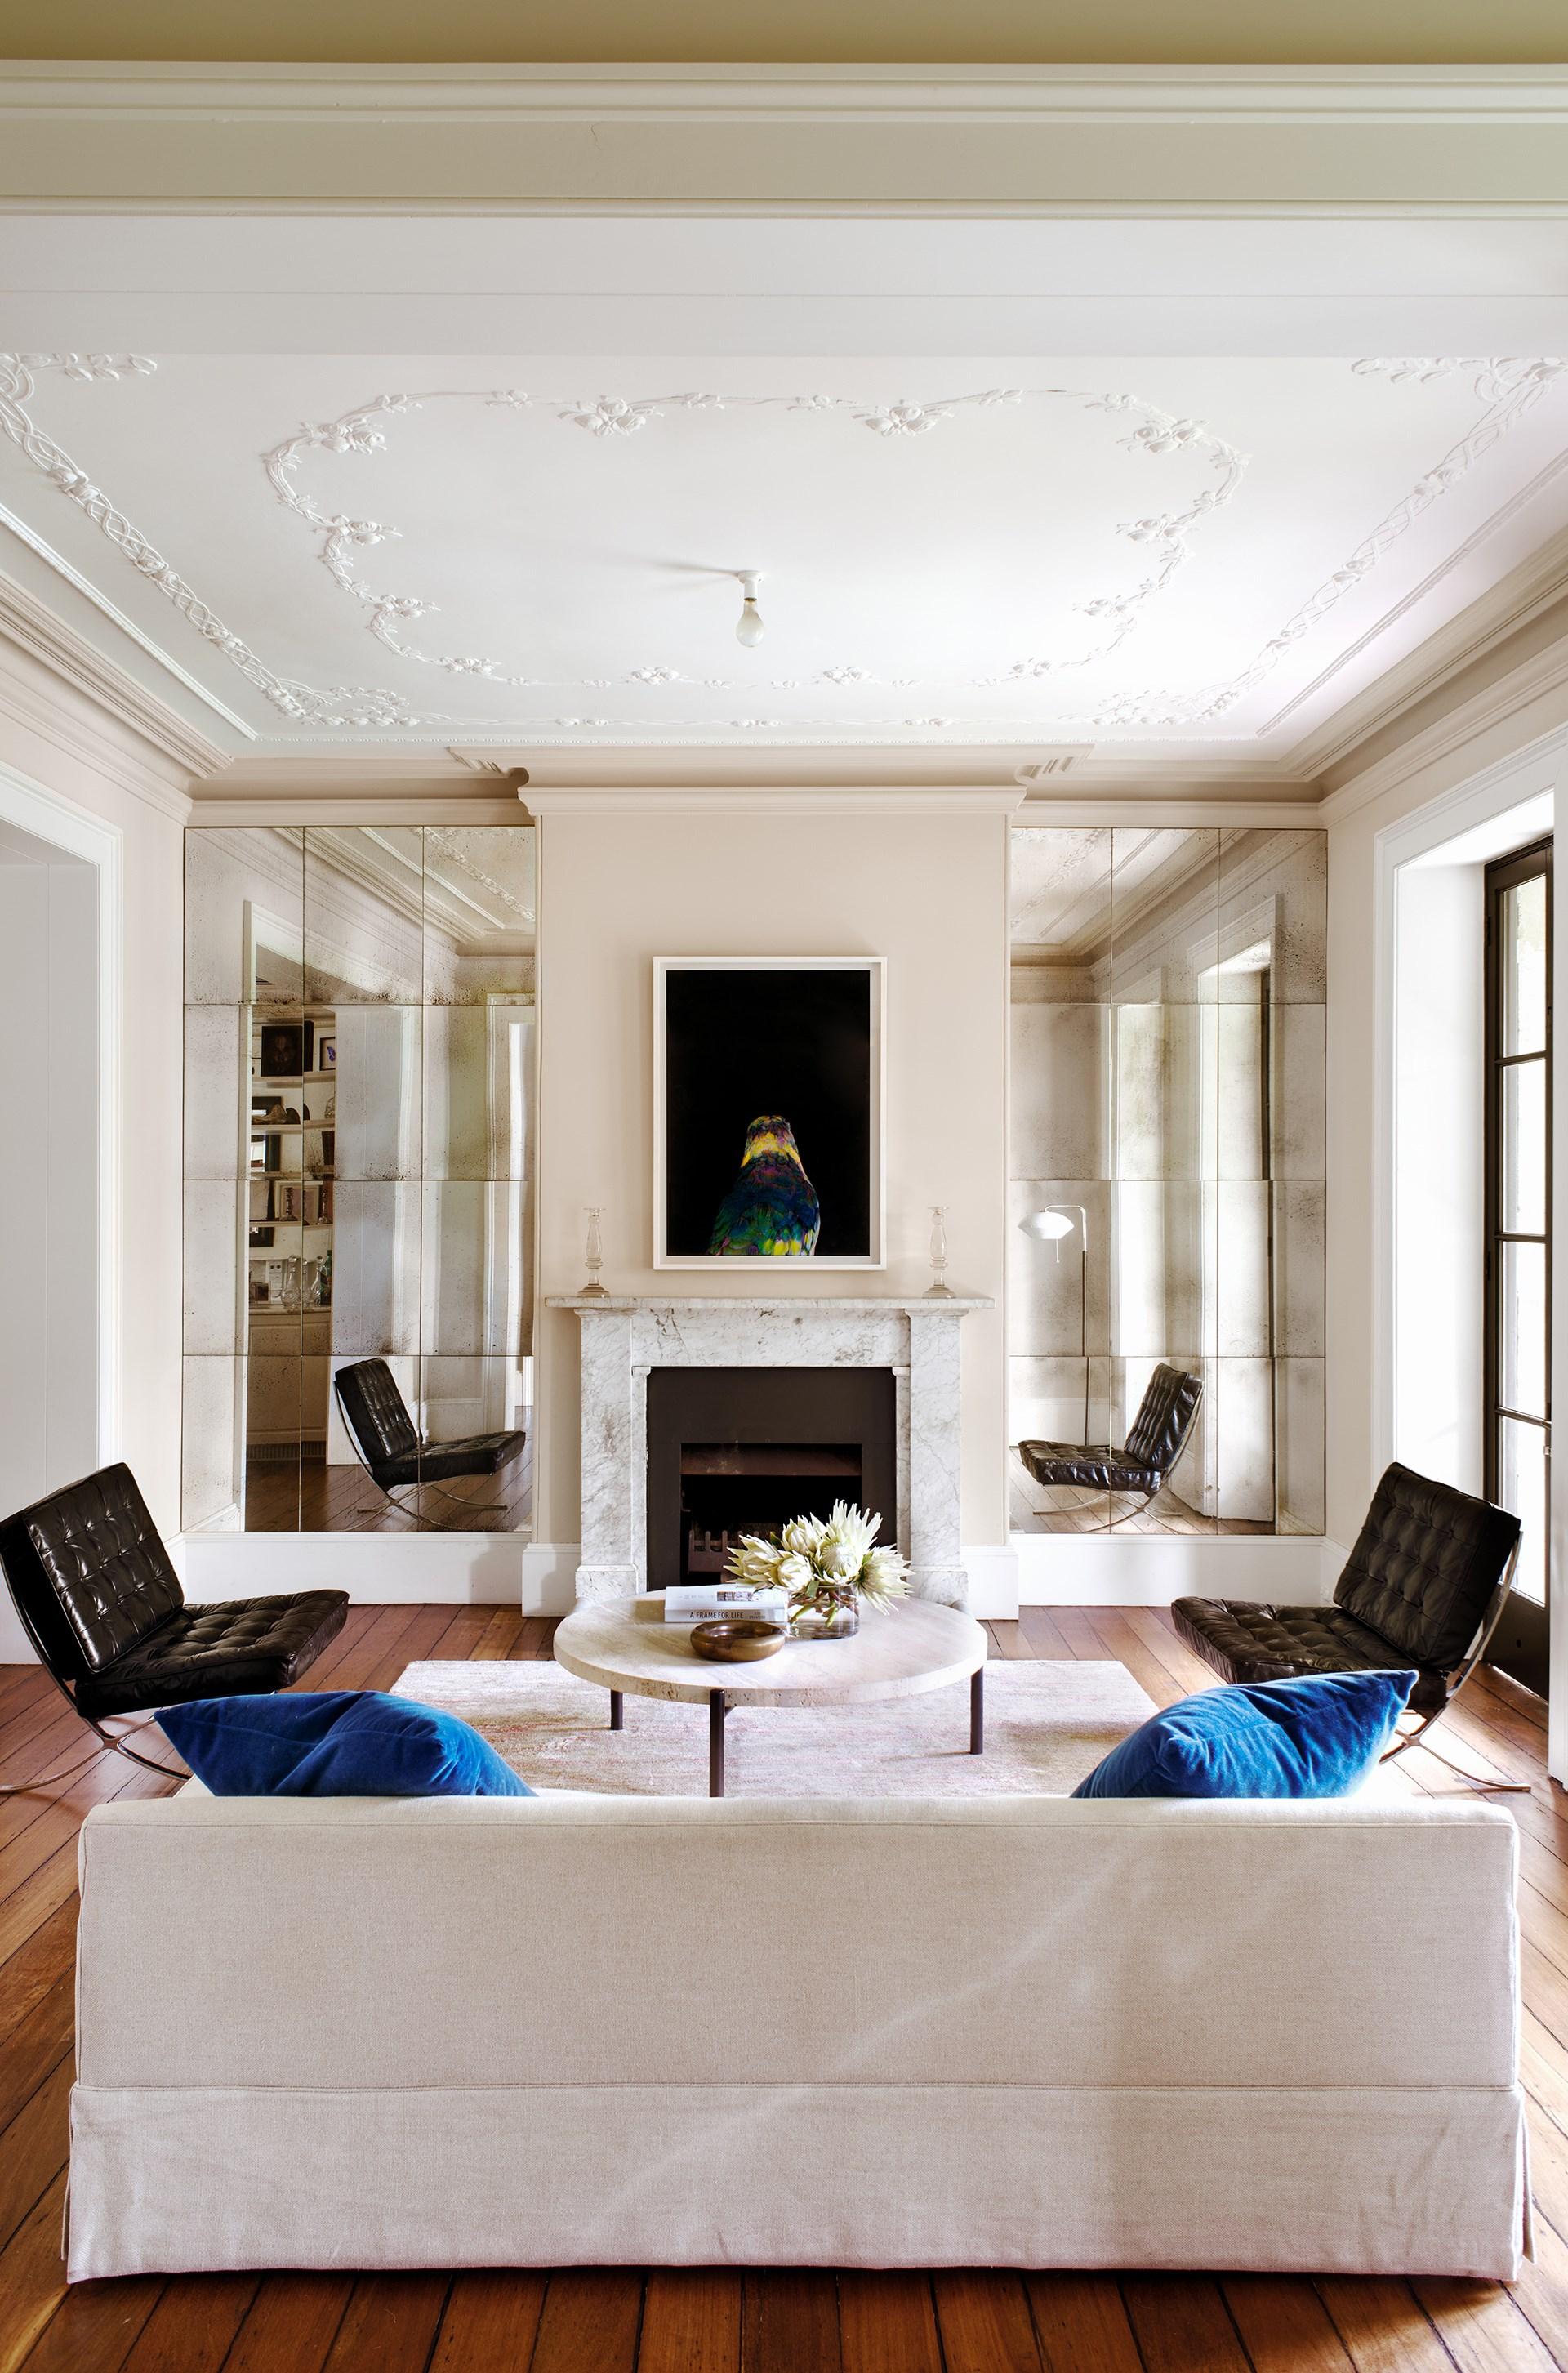 Create symmetry by arranging furniture to mirror each other. Photo: Nicholas Watt